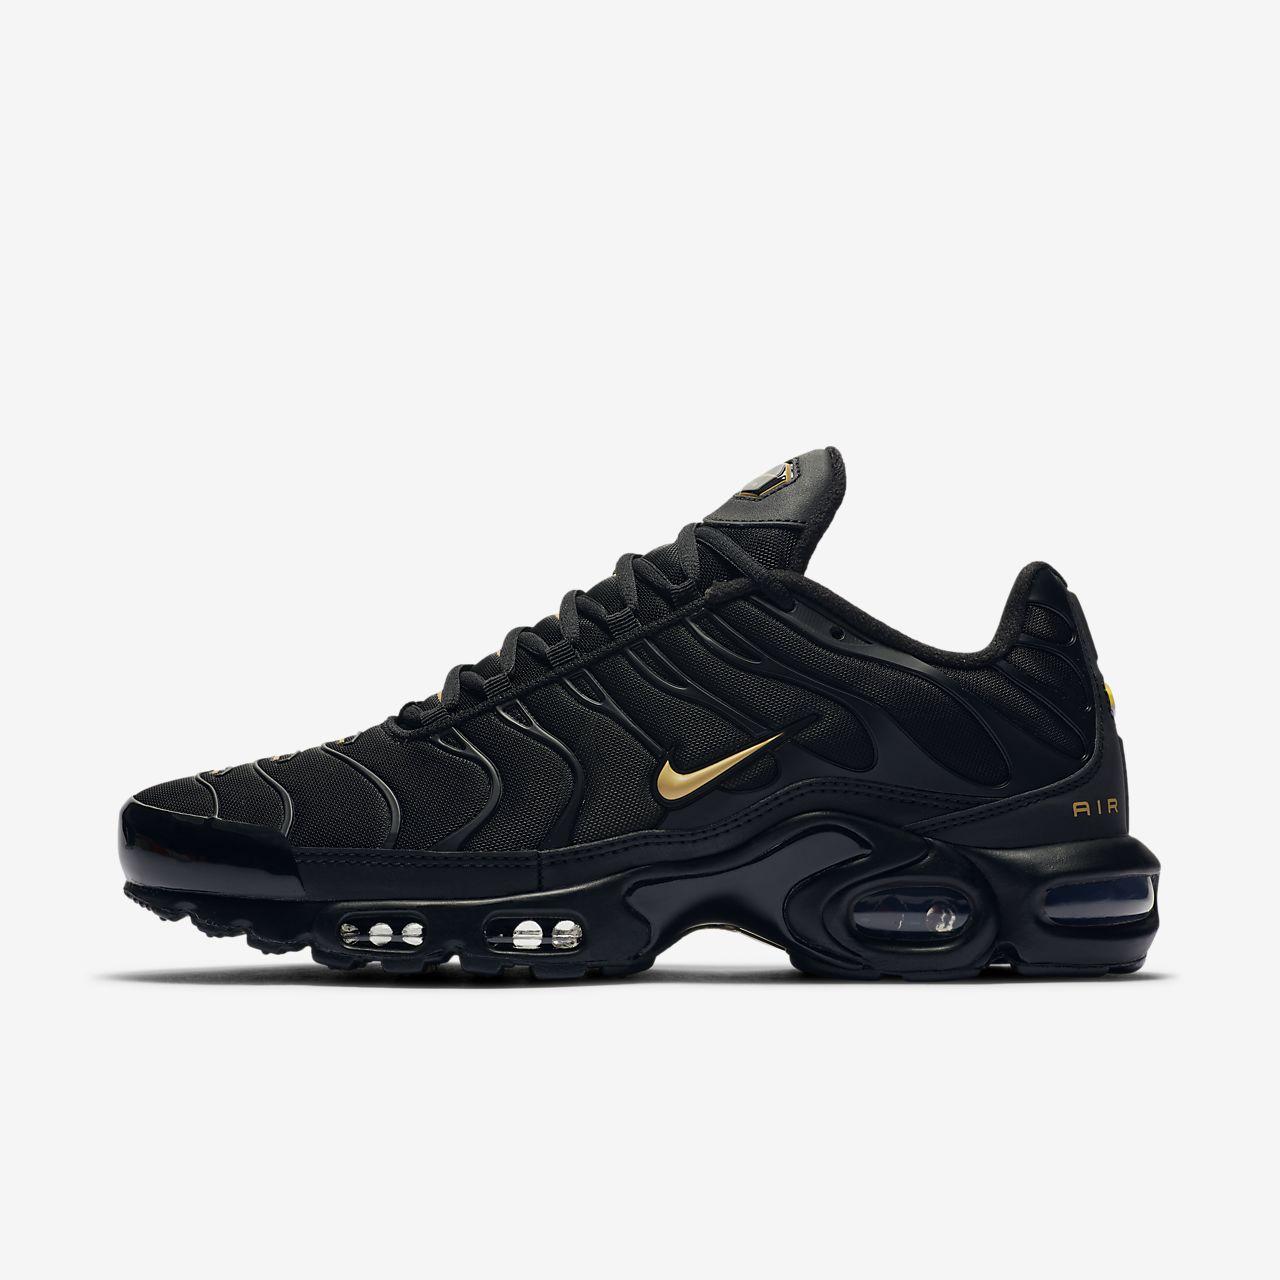 nike skor billigt i sverige, Nike Air Max tn mäns svart